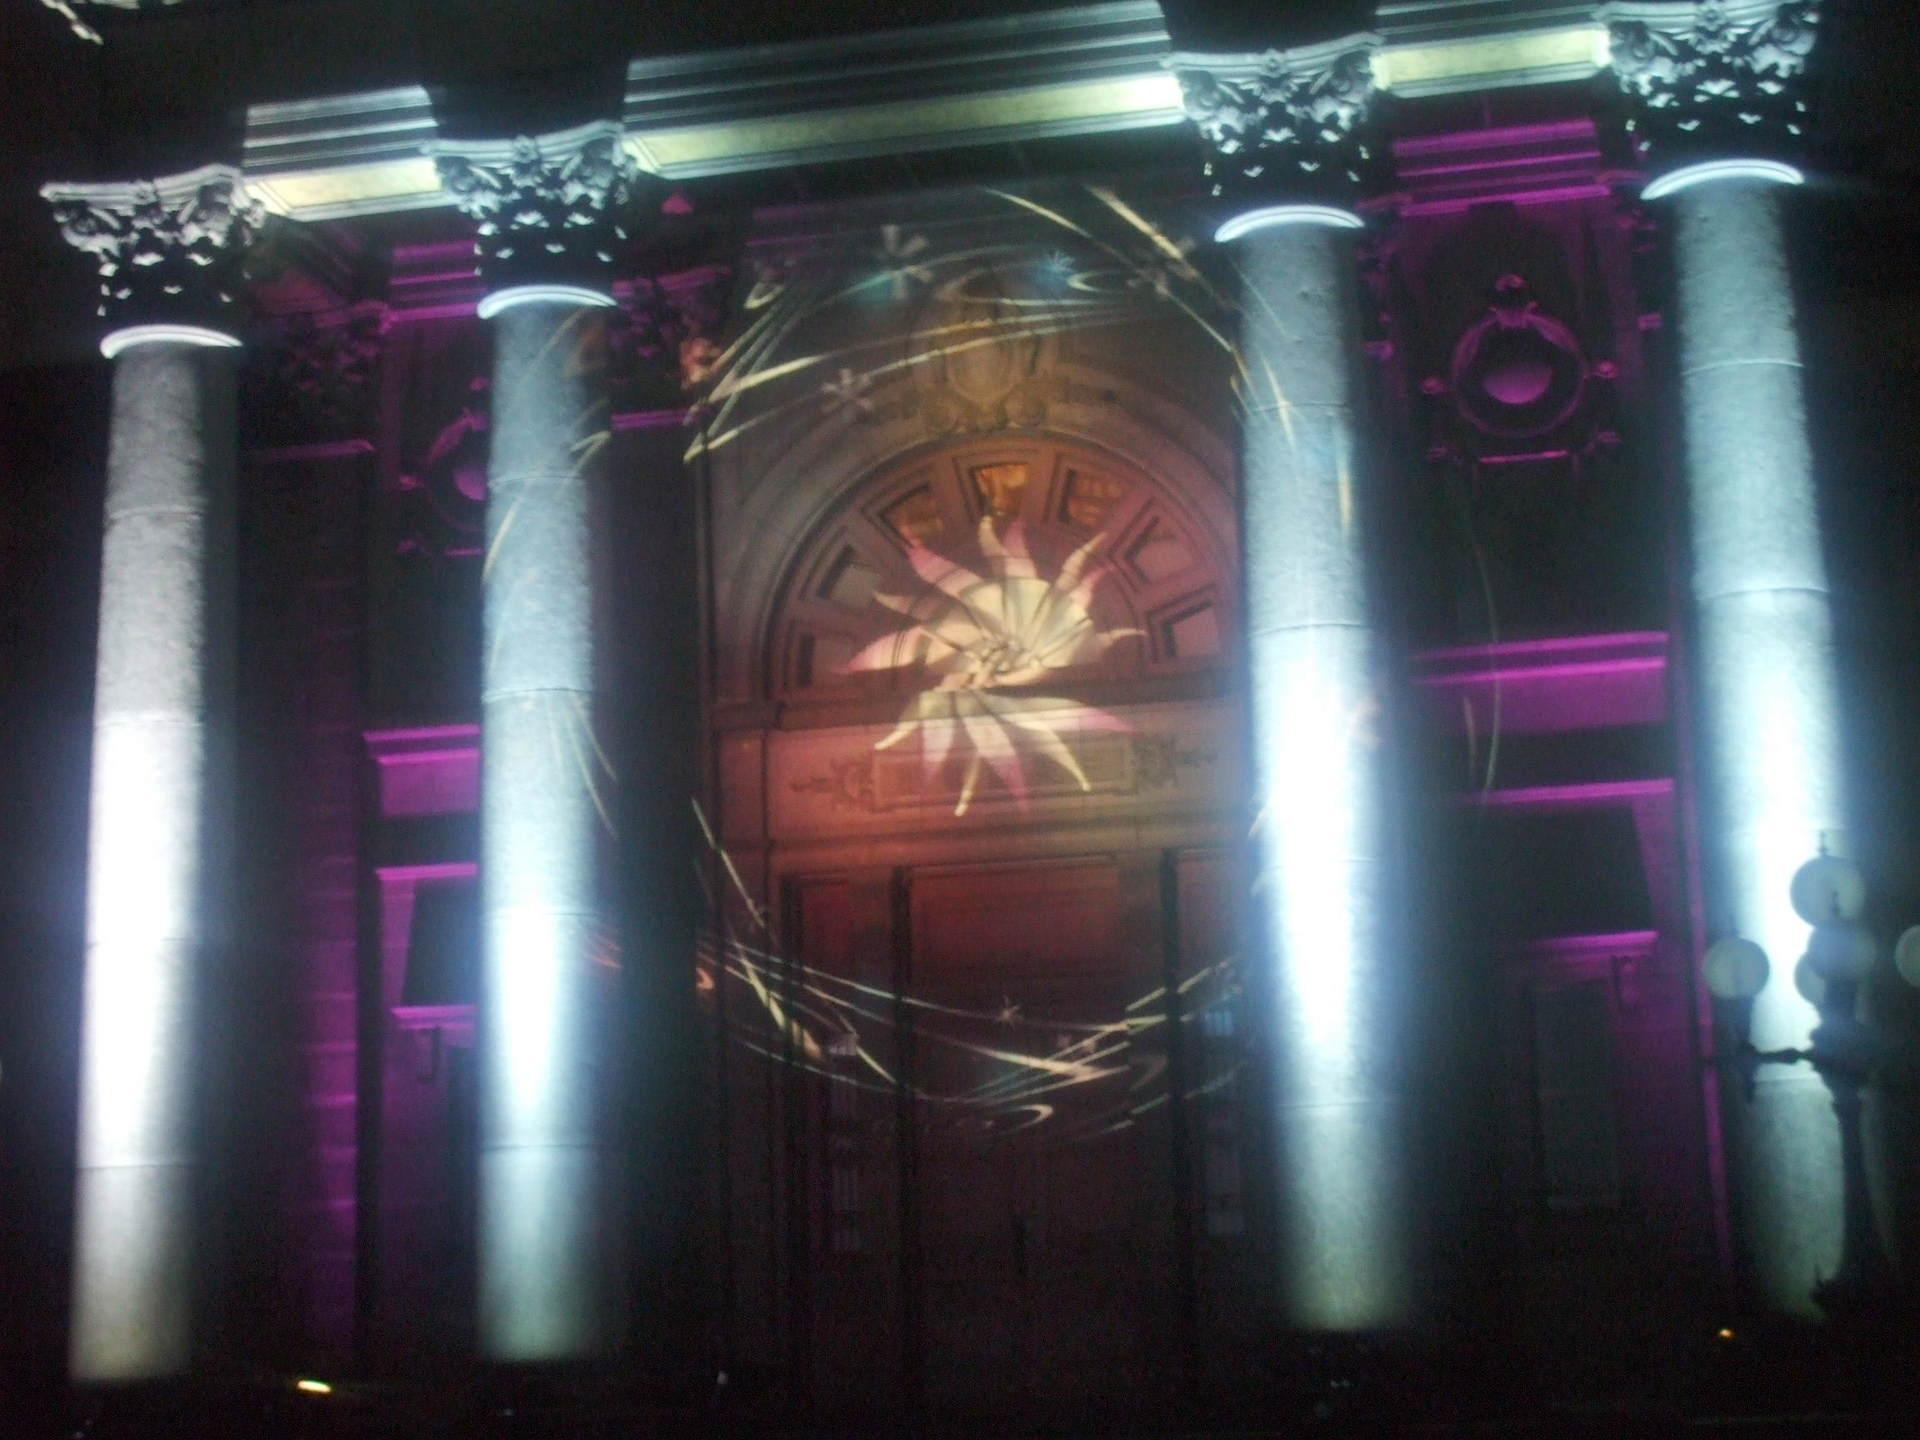 【OSAKA光のルネサンス】 ウォールタペストリーが美しい!